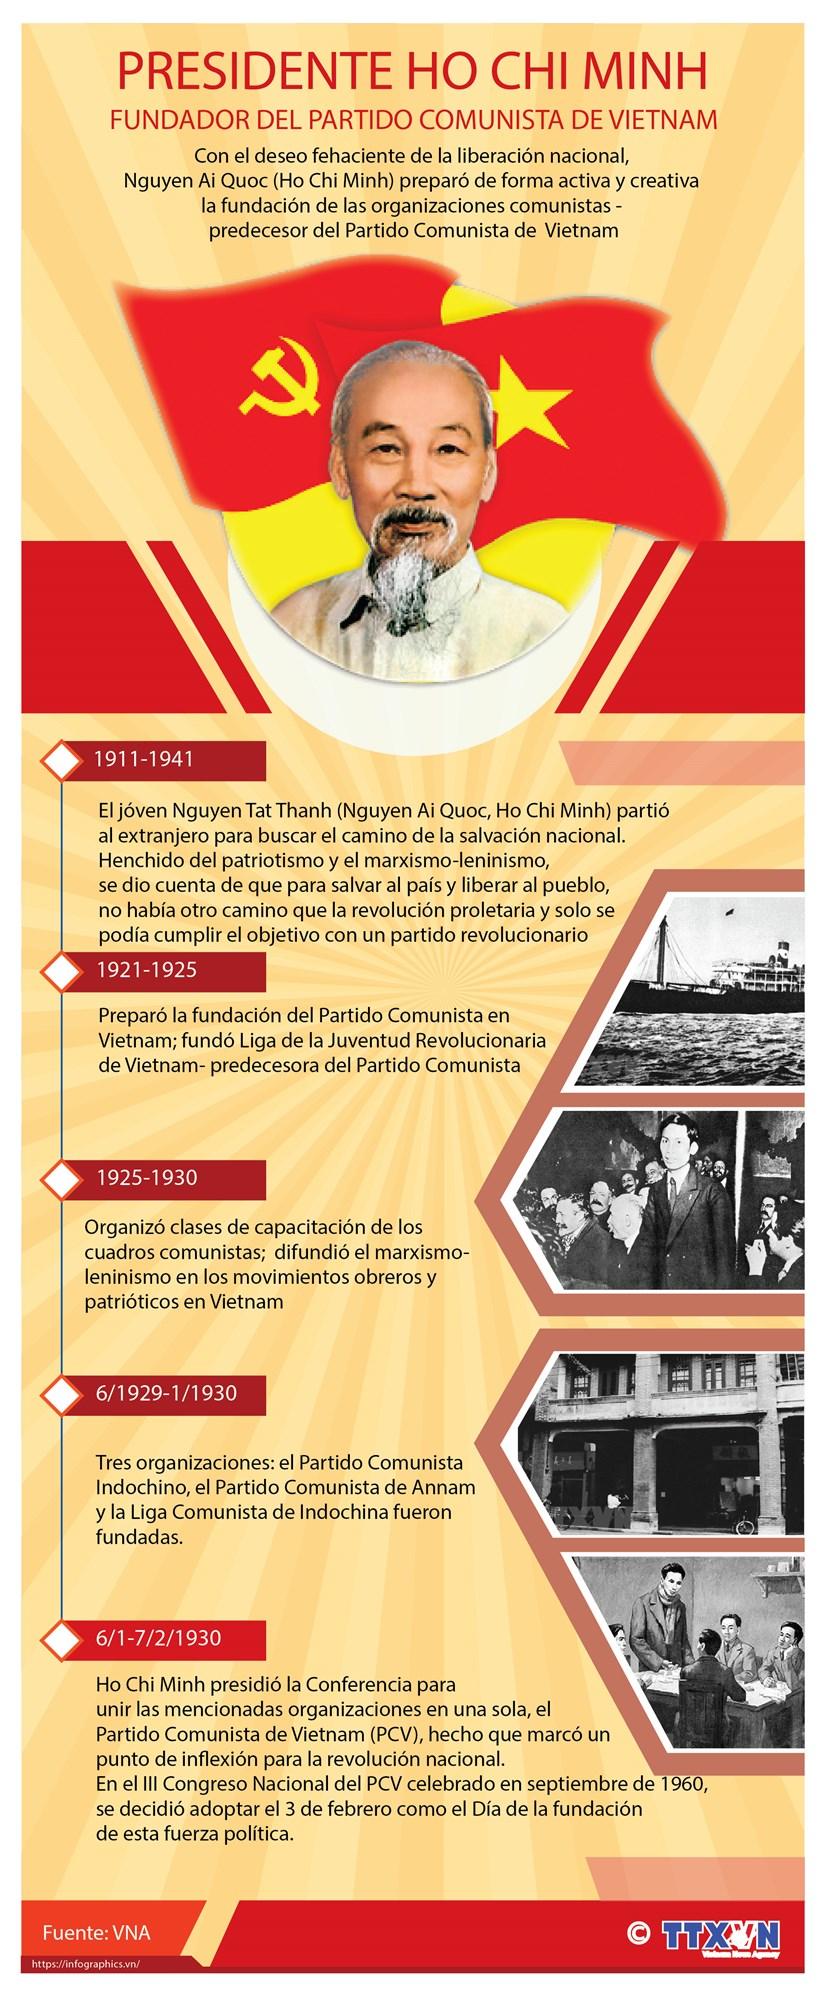 Presidente Ho Chi Minh, fundador del Partido Comunista de Vietnam hinh anh 1